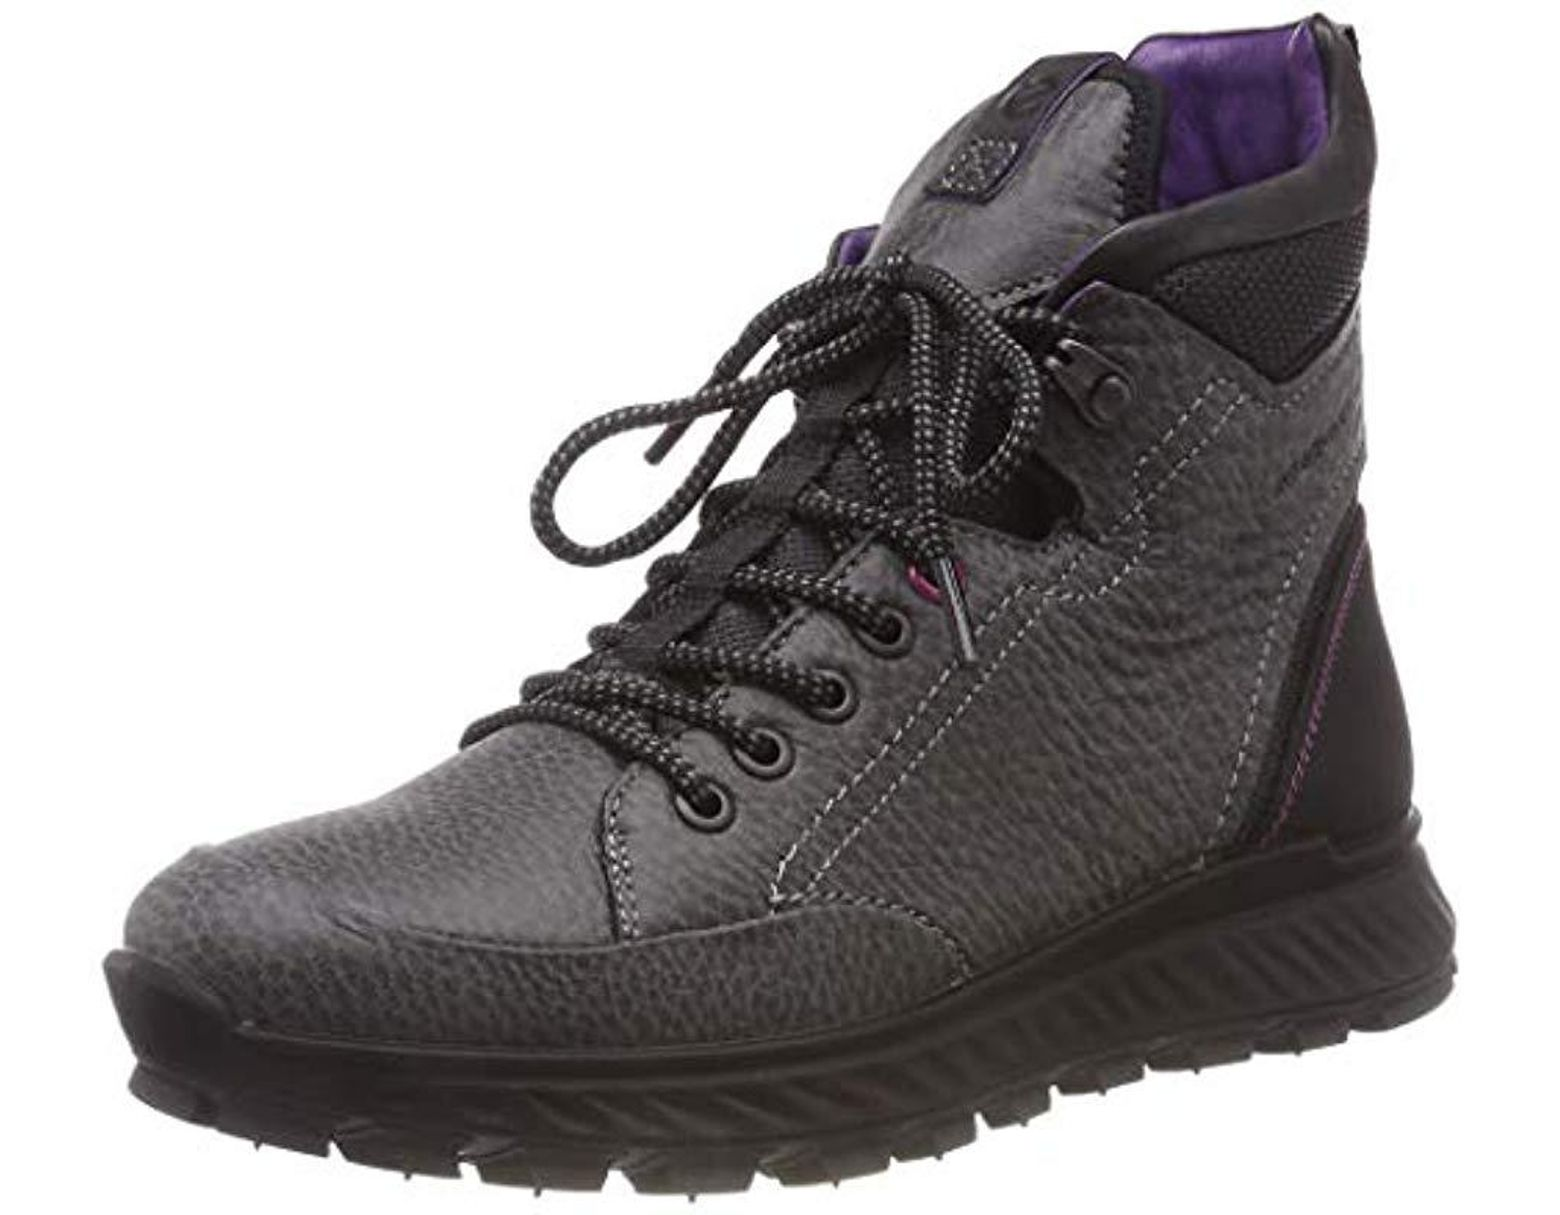 09cf406b7c967 Ecco Exostrike Boots in Black - Lyst